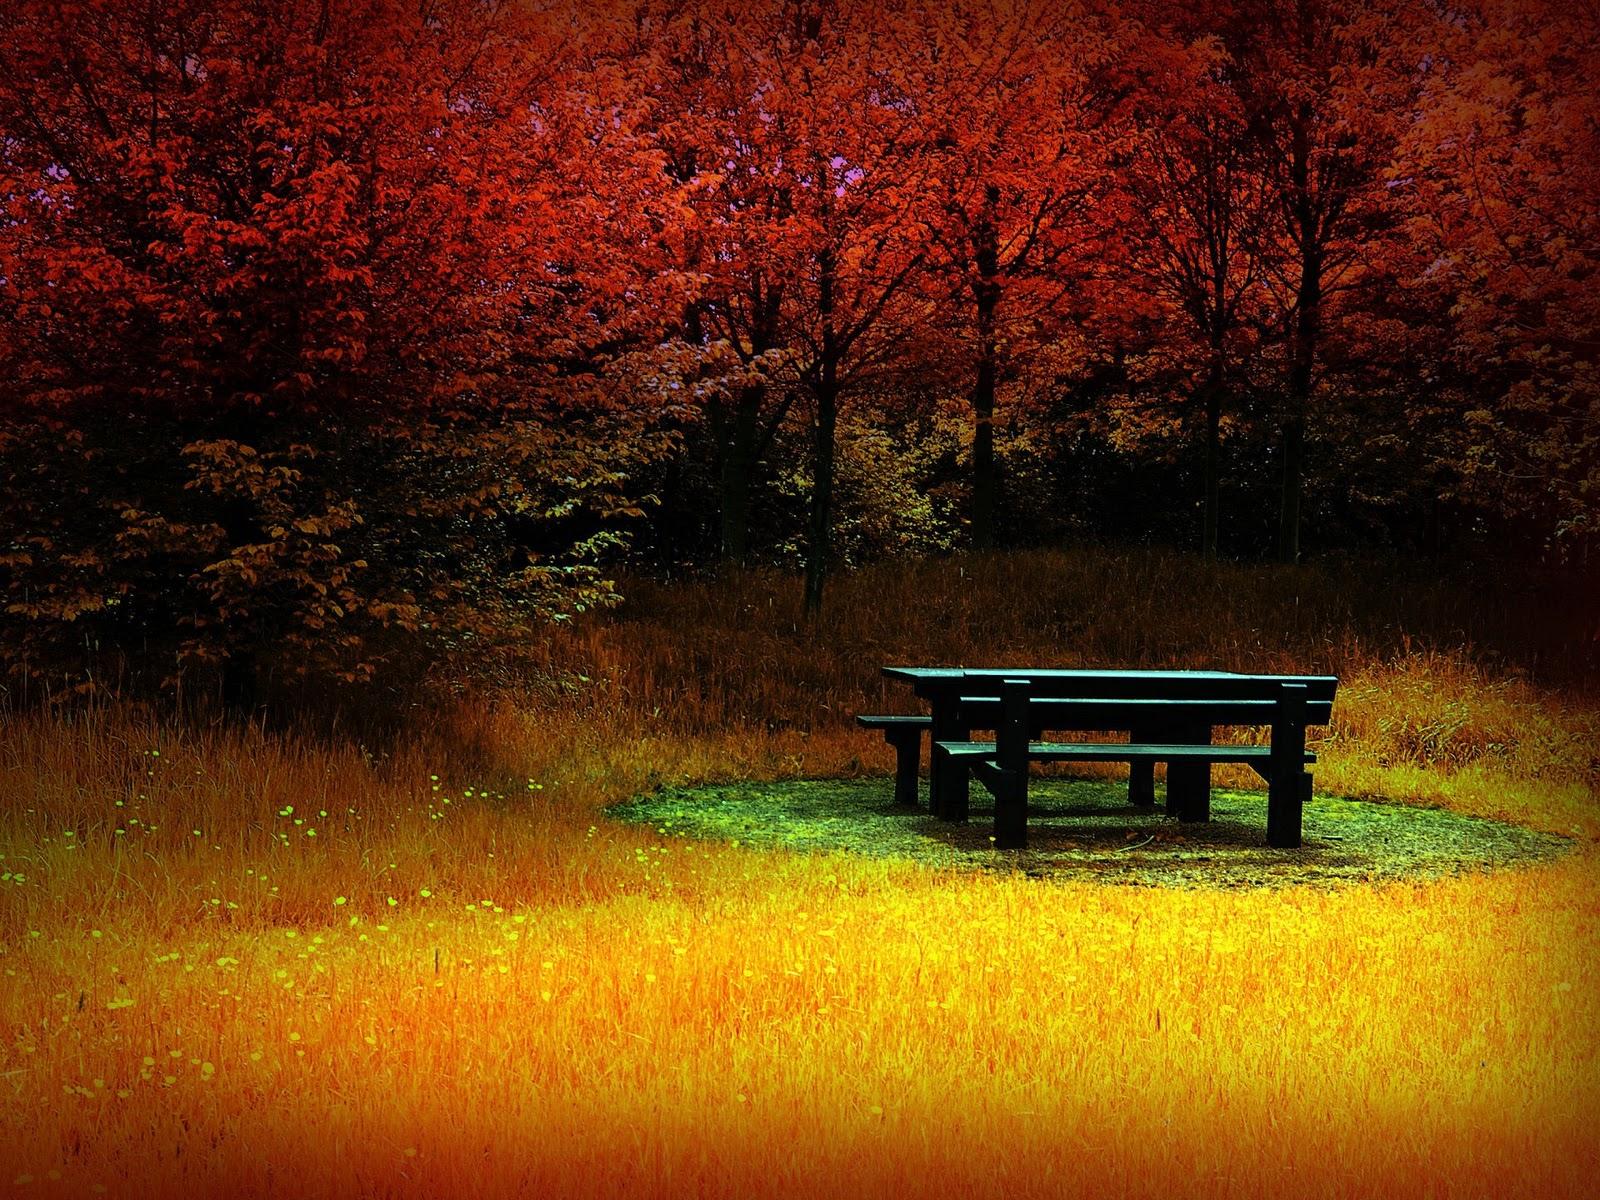 ... gambar gambar pemandangan musim gugur ini betapa indahnya daun daun